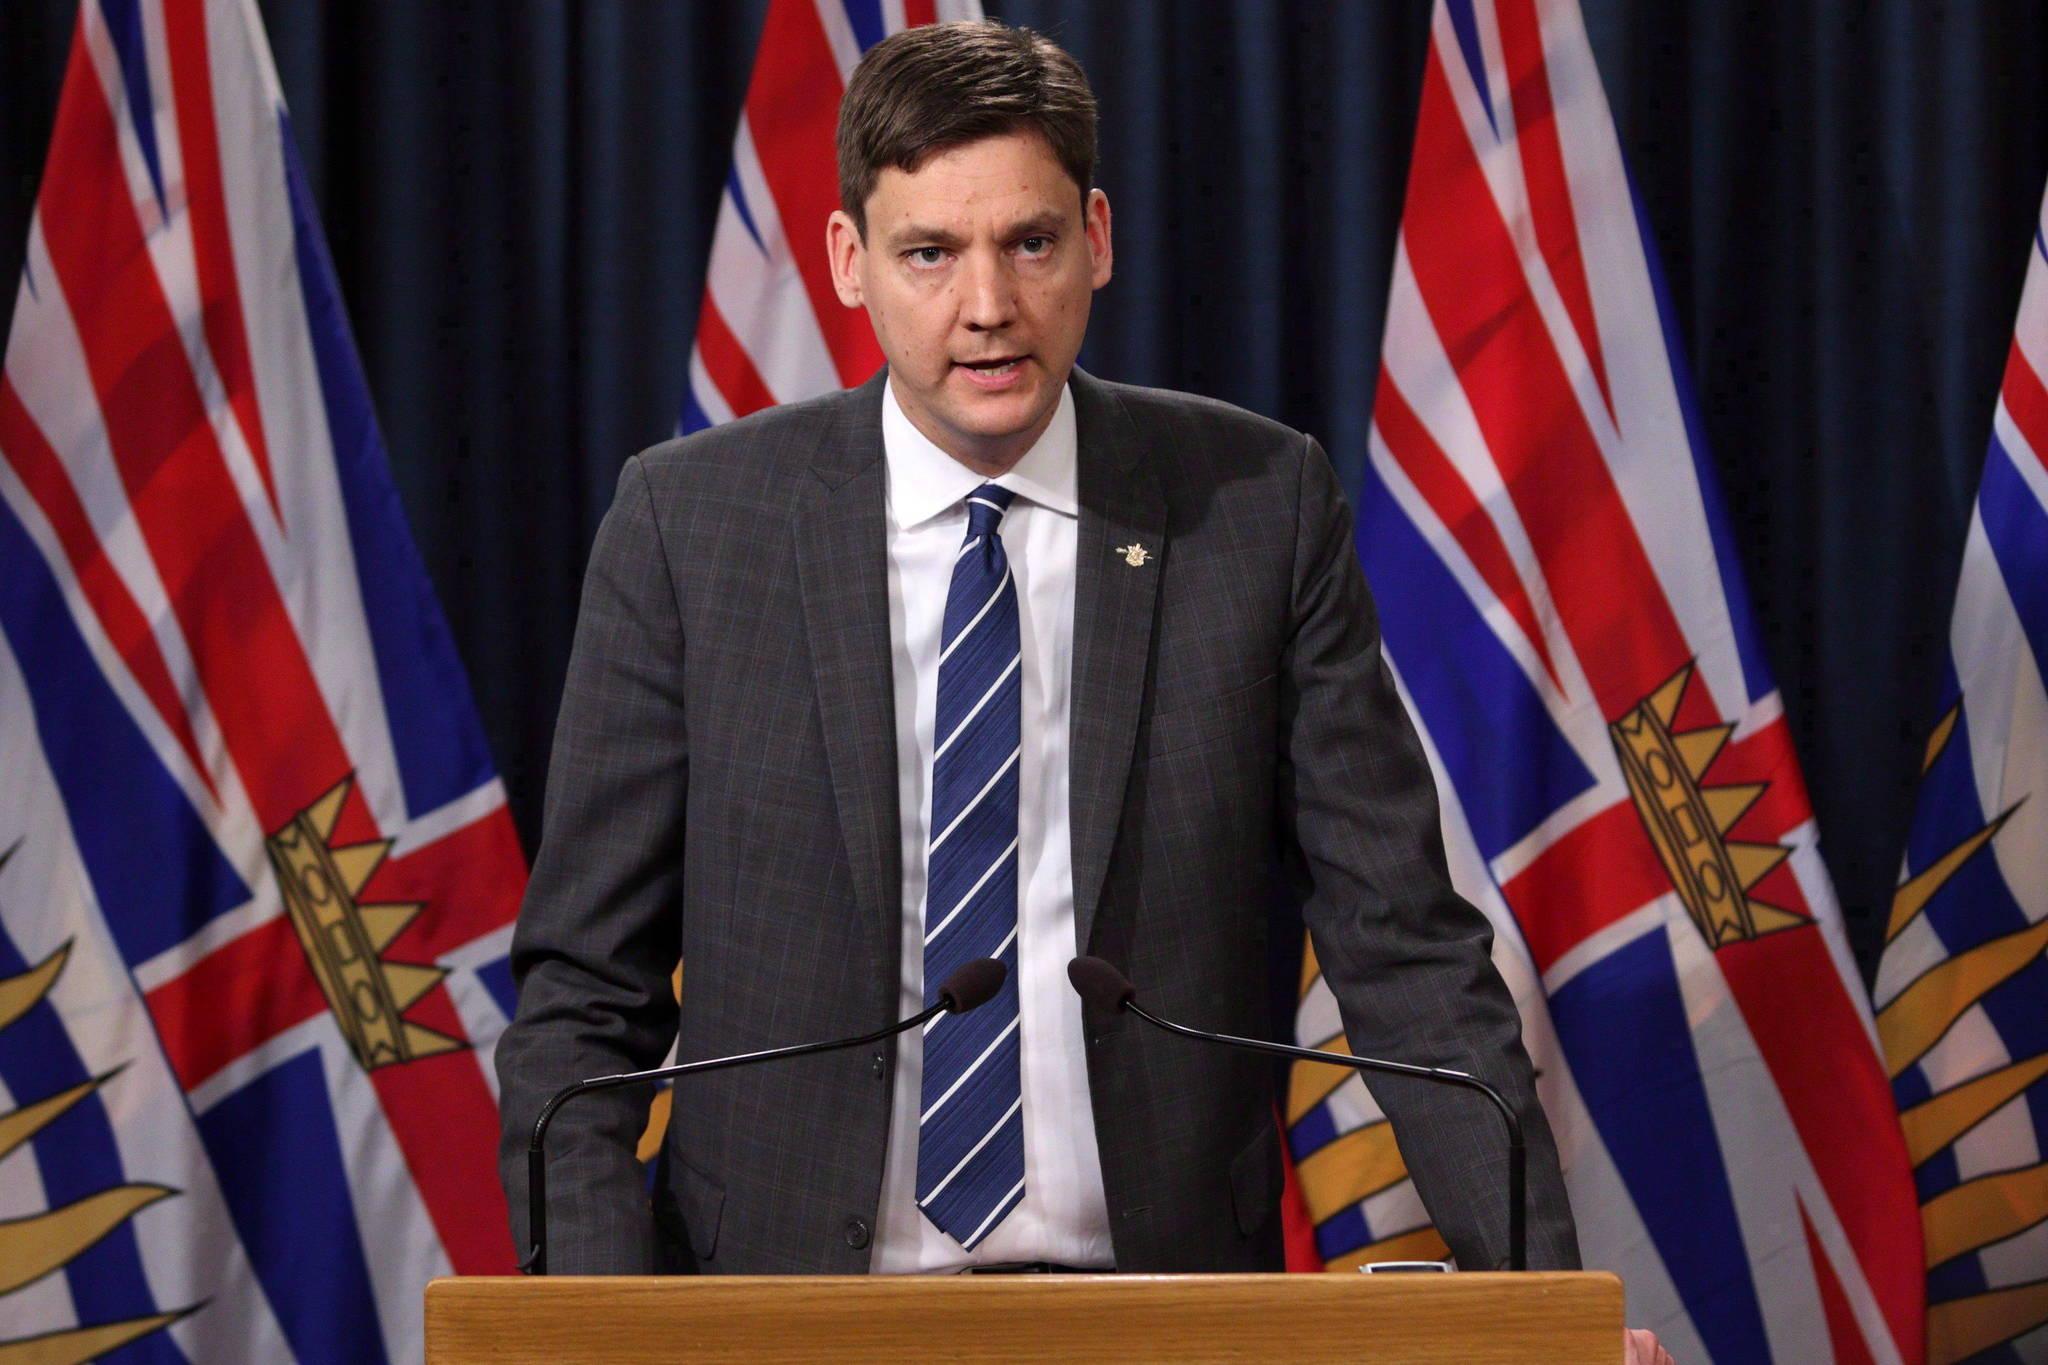 B.C. Attorney General David Eby. (Photo: THE CANADIAN PRESS/Chad Hipolito)